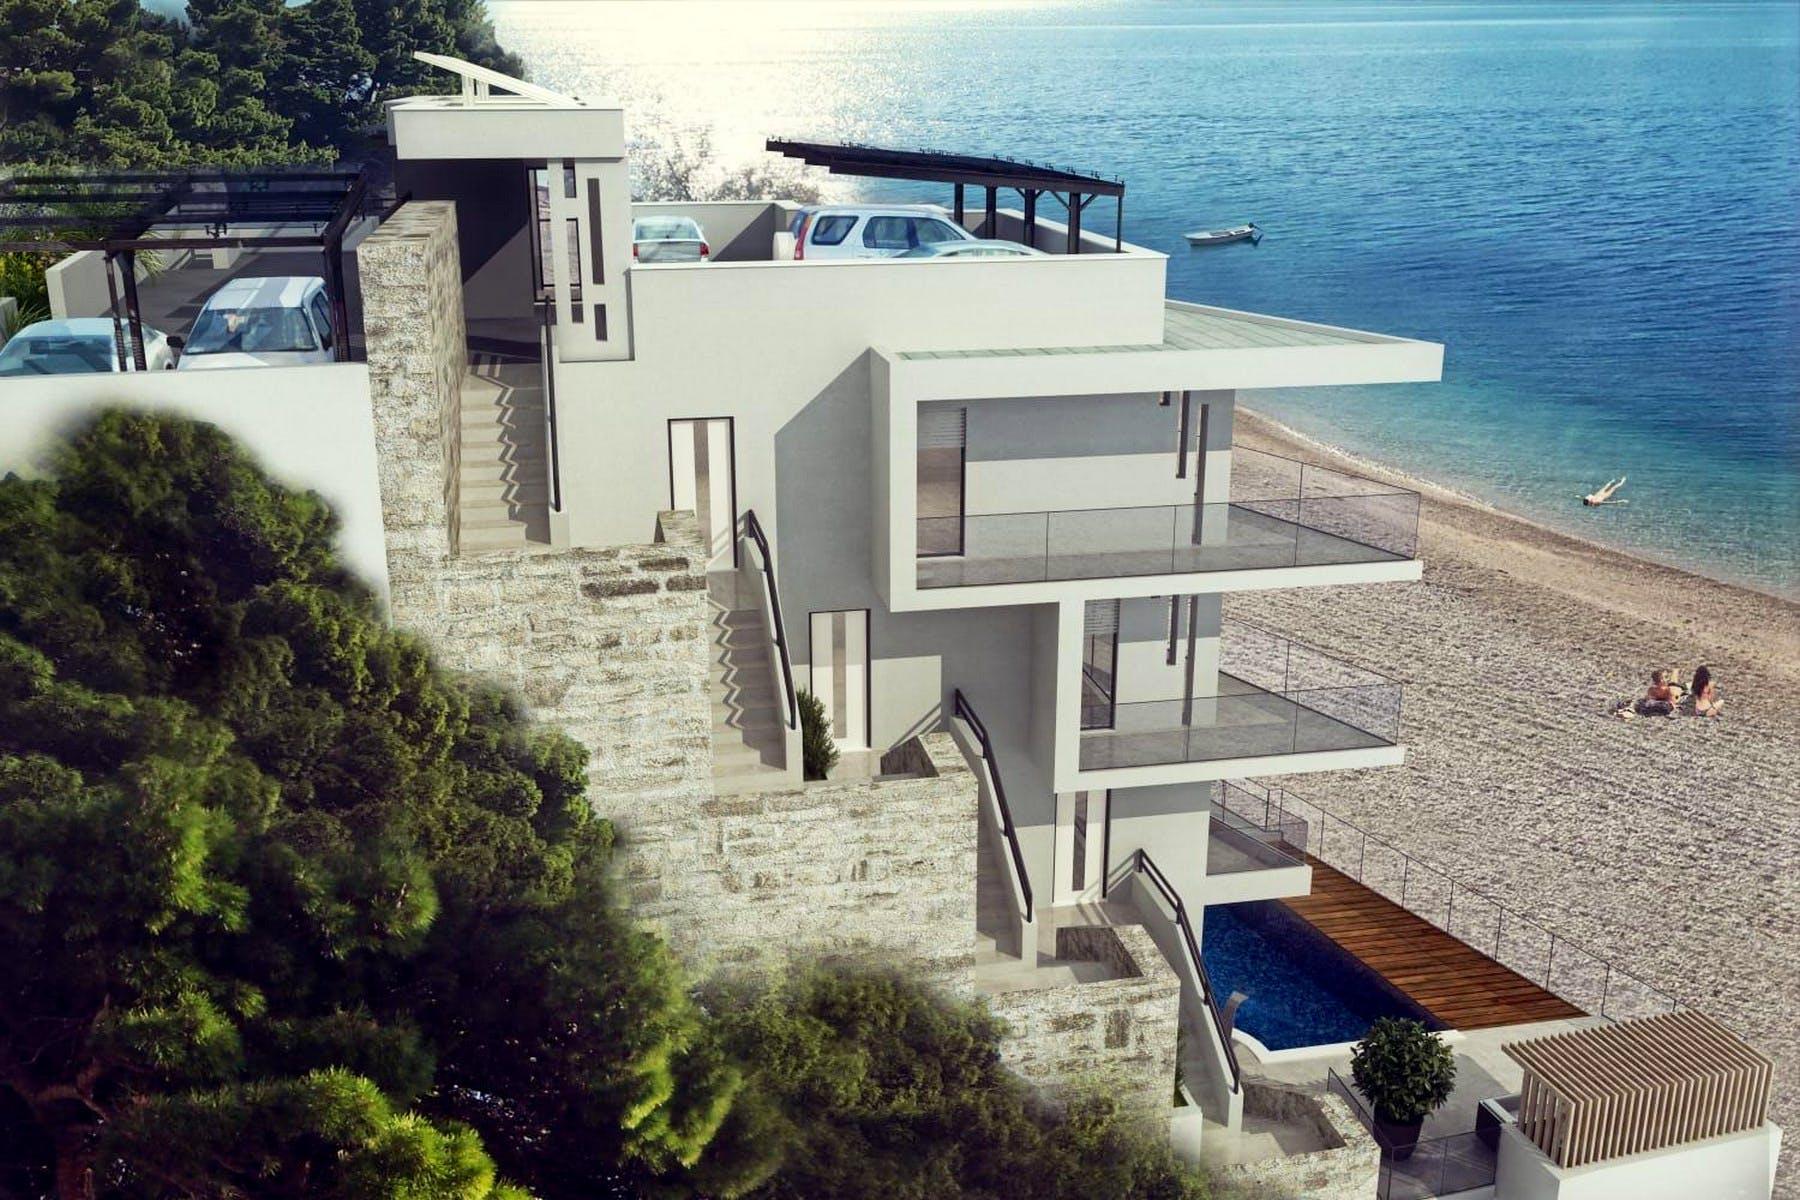 Cotemporary villa under construction for sale